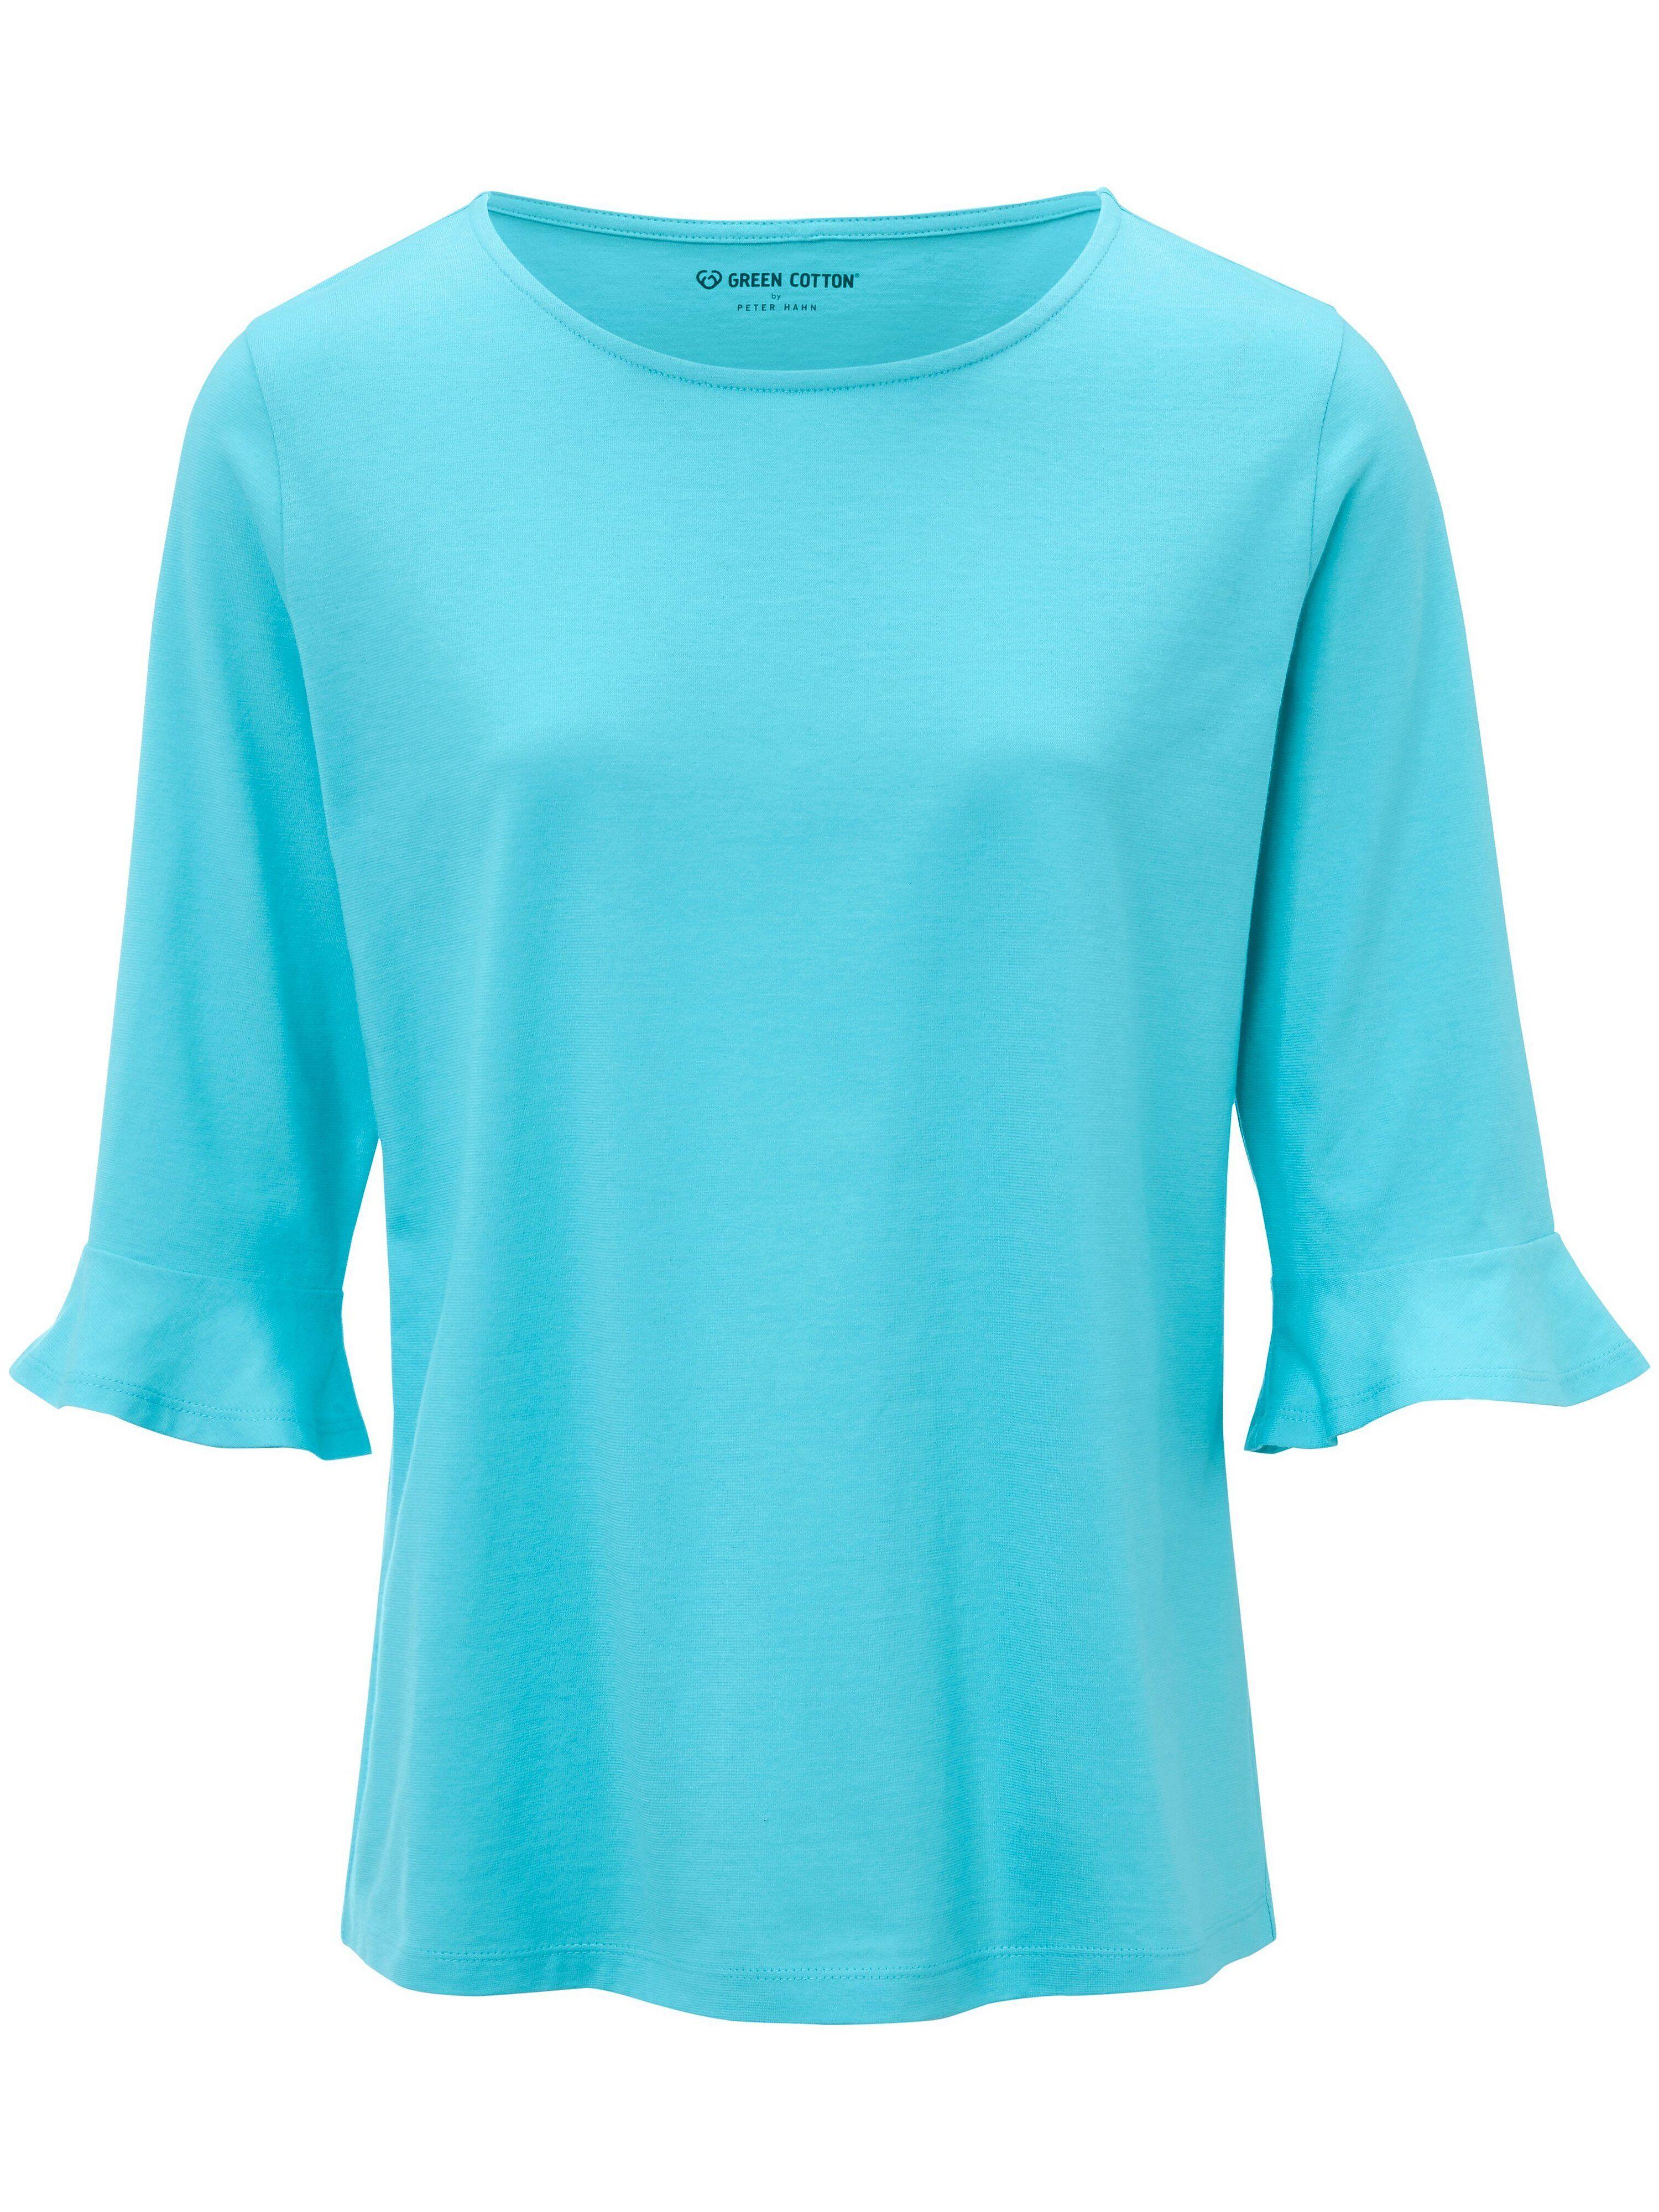 Green Cotton Le T-shirt 100% coton manches 3/4  Green Cotton turquoise  - Femme - 40